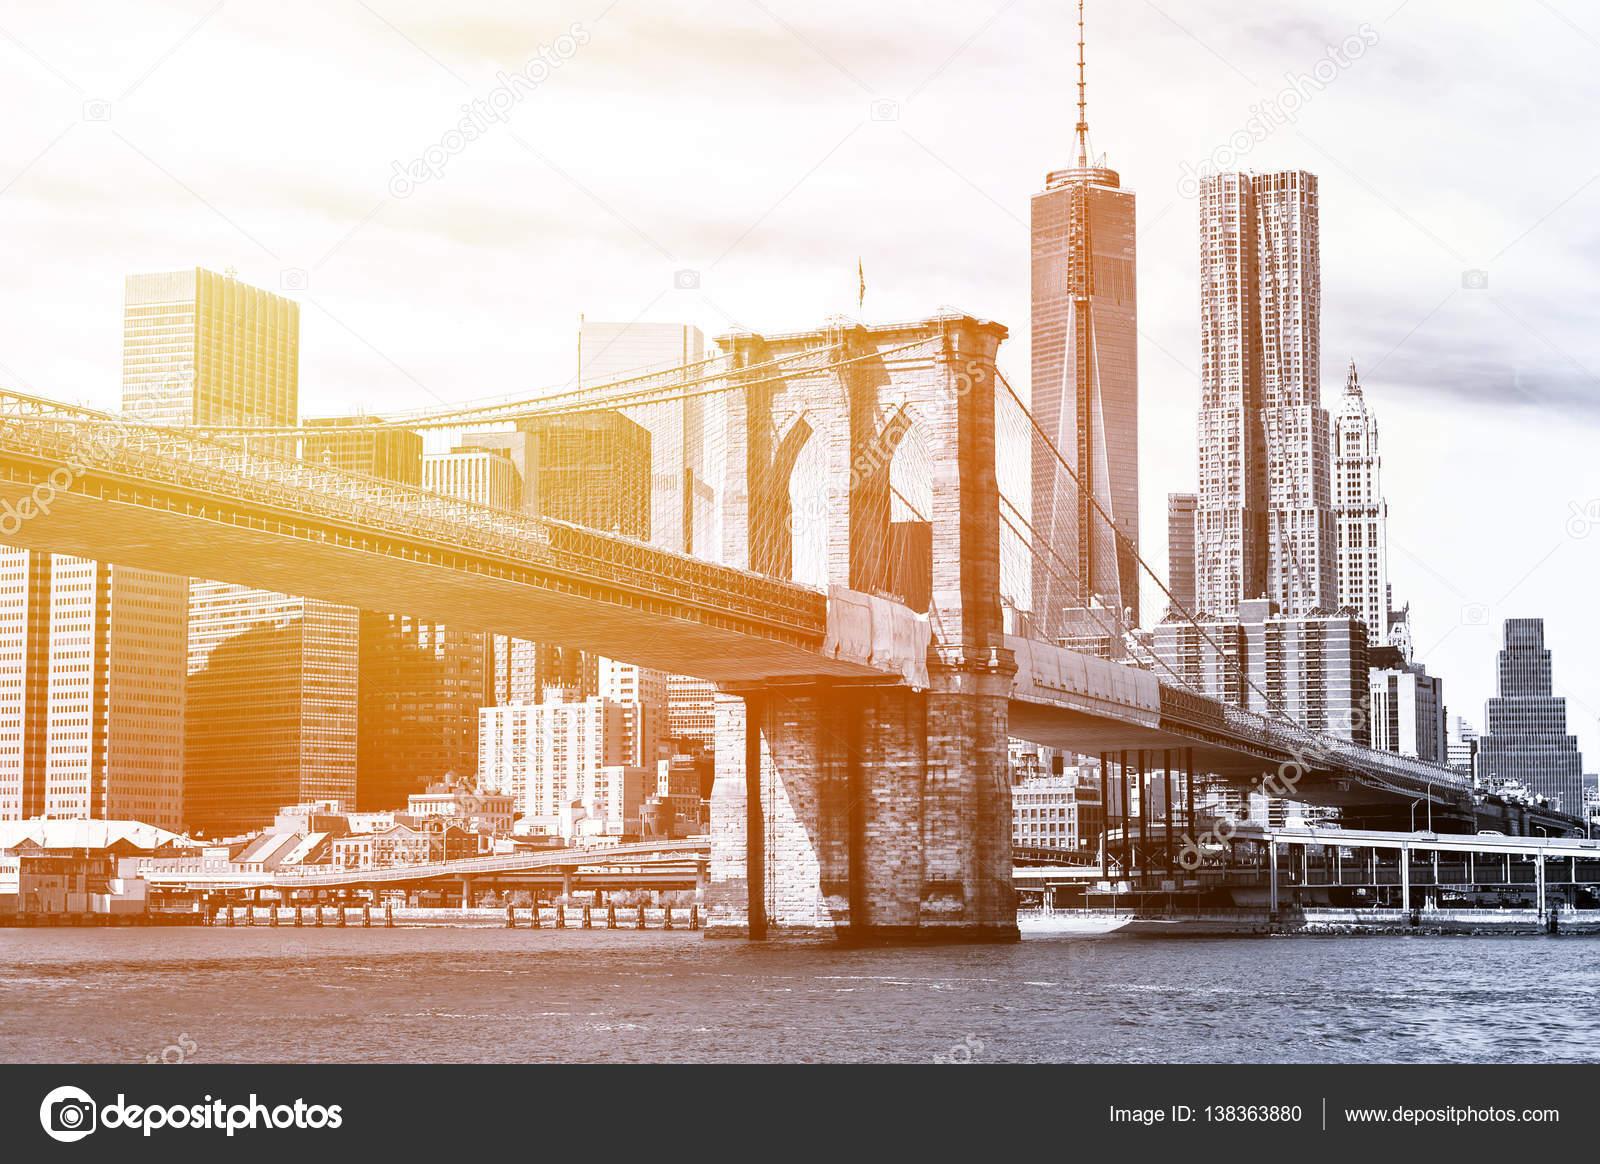 schwarz wei new york skyline bei sonnenuntergang stockfoto cla1978 138363880. Black Bedroom Furniture Sets. Home Design Ideas